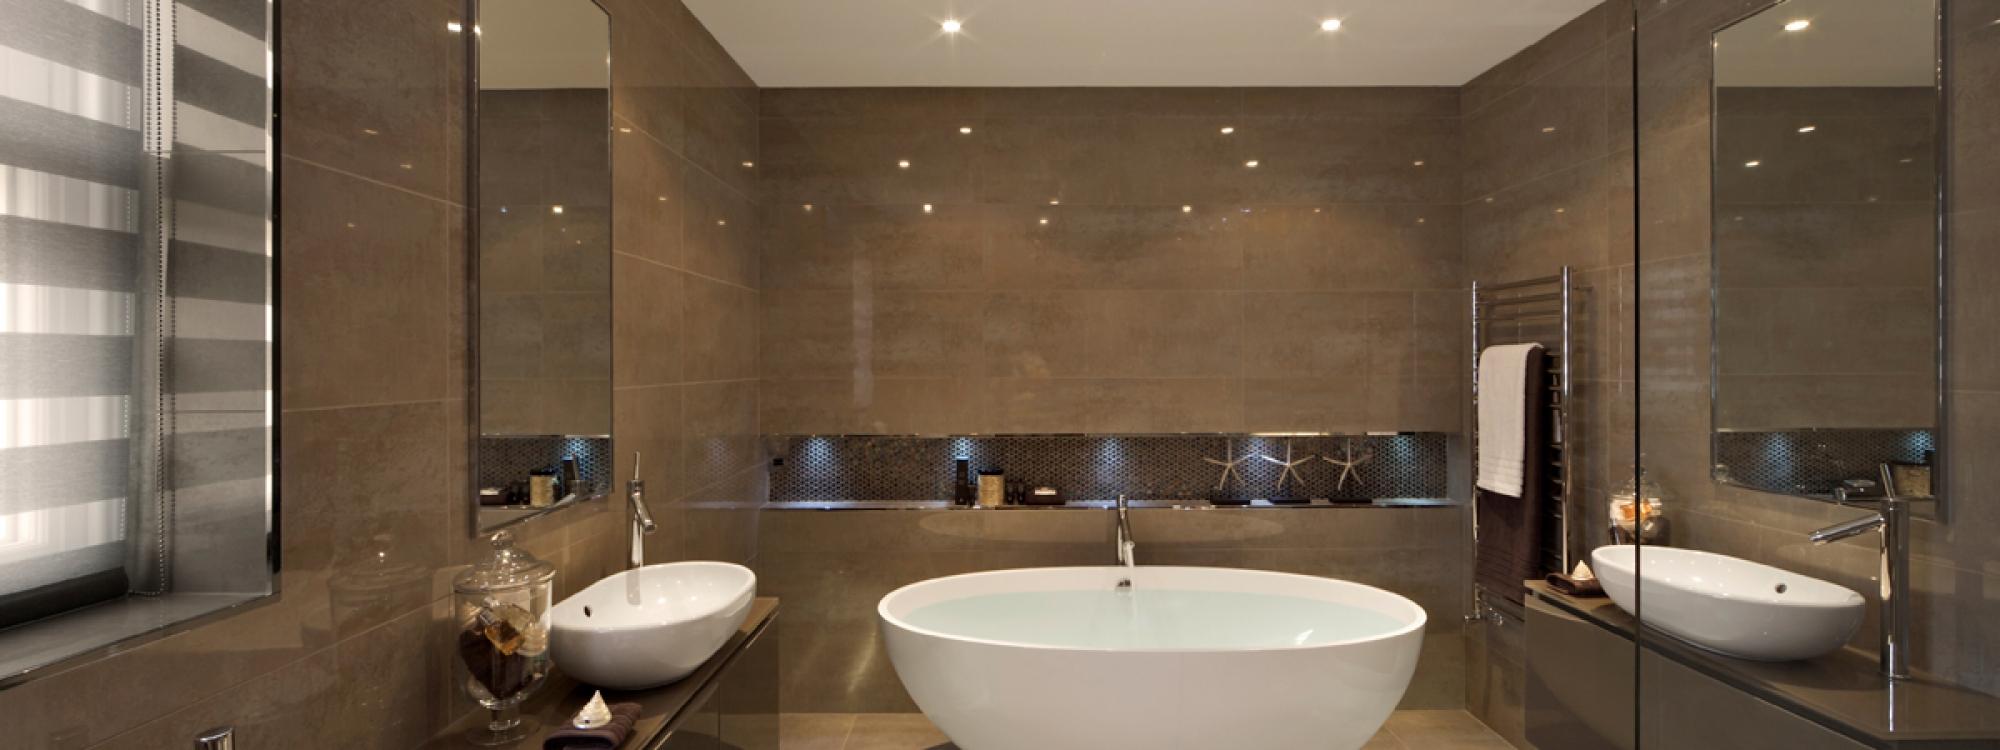 Internal Home Improvements More Build Leeds